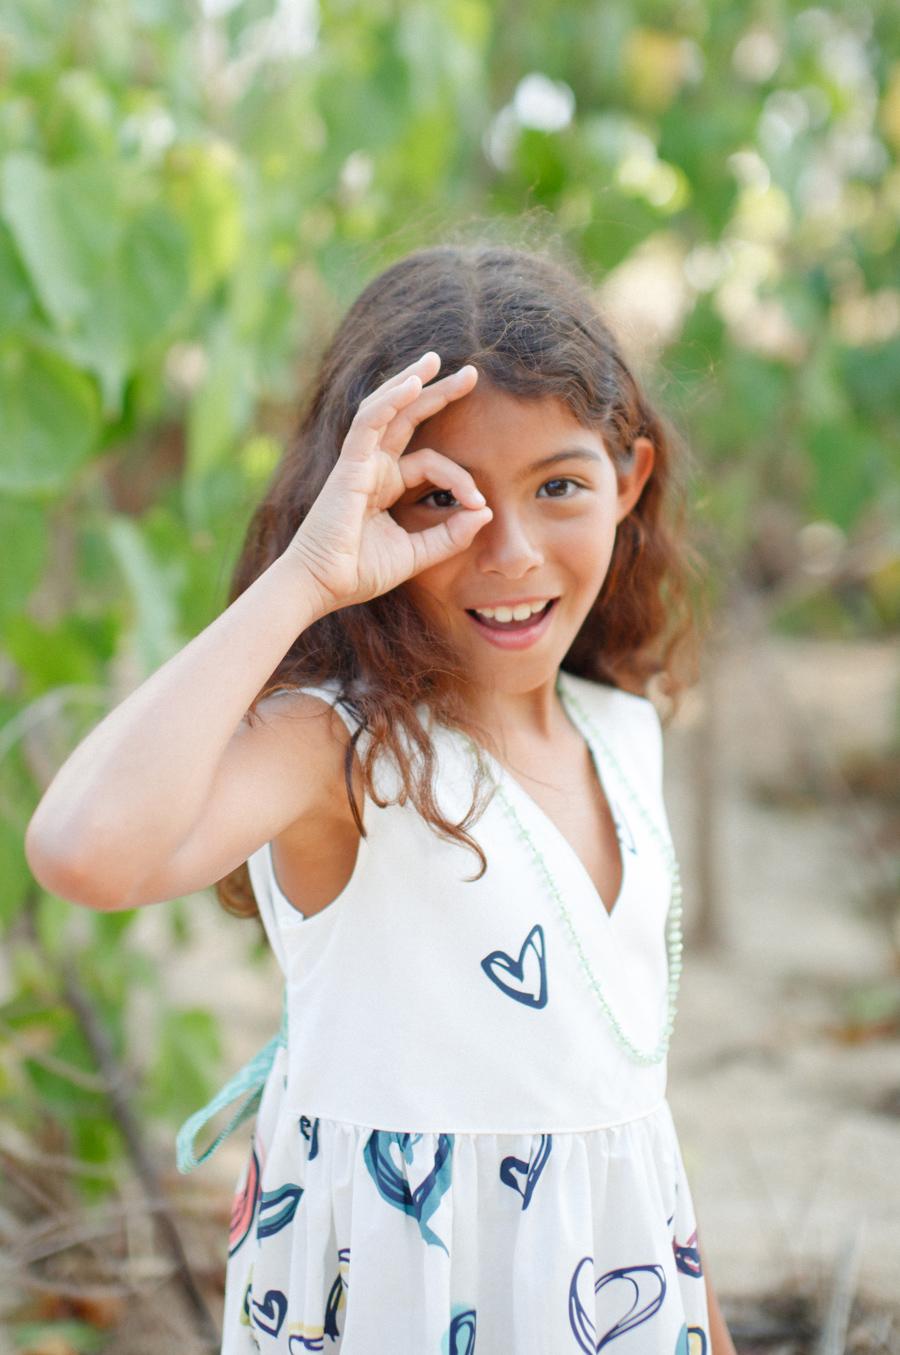 Children's Editorial Photography